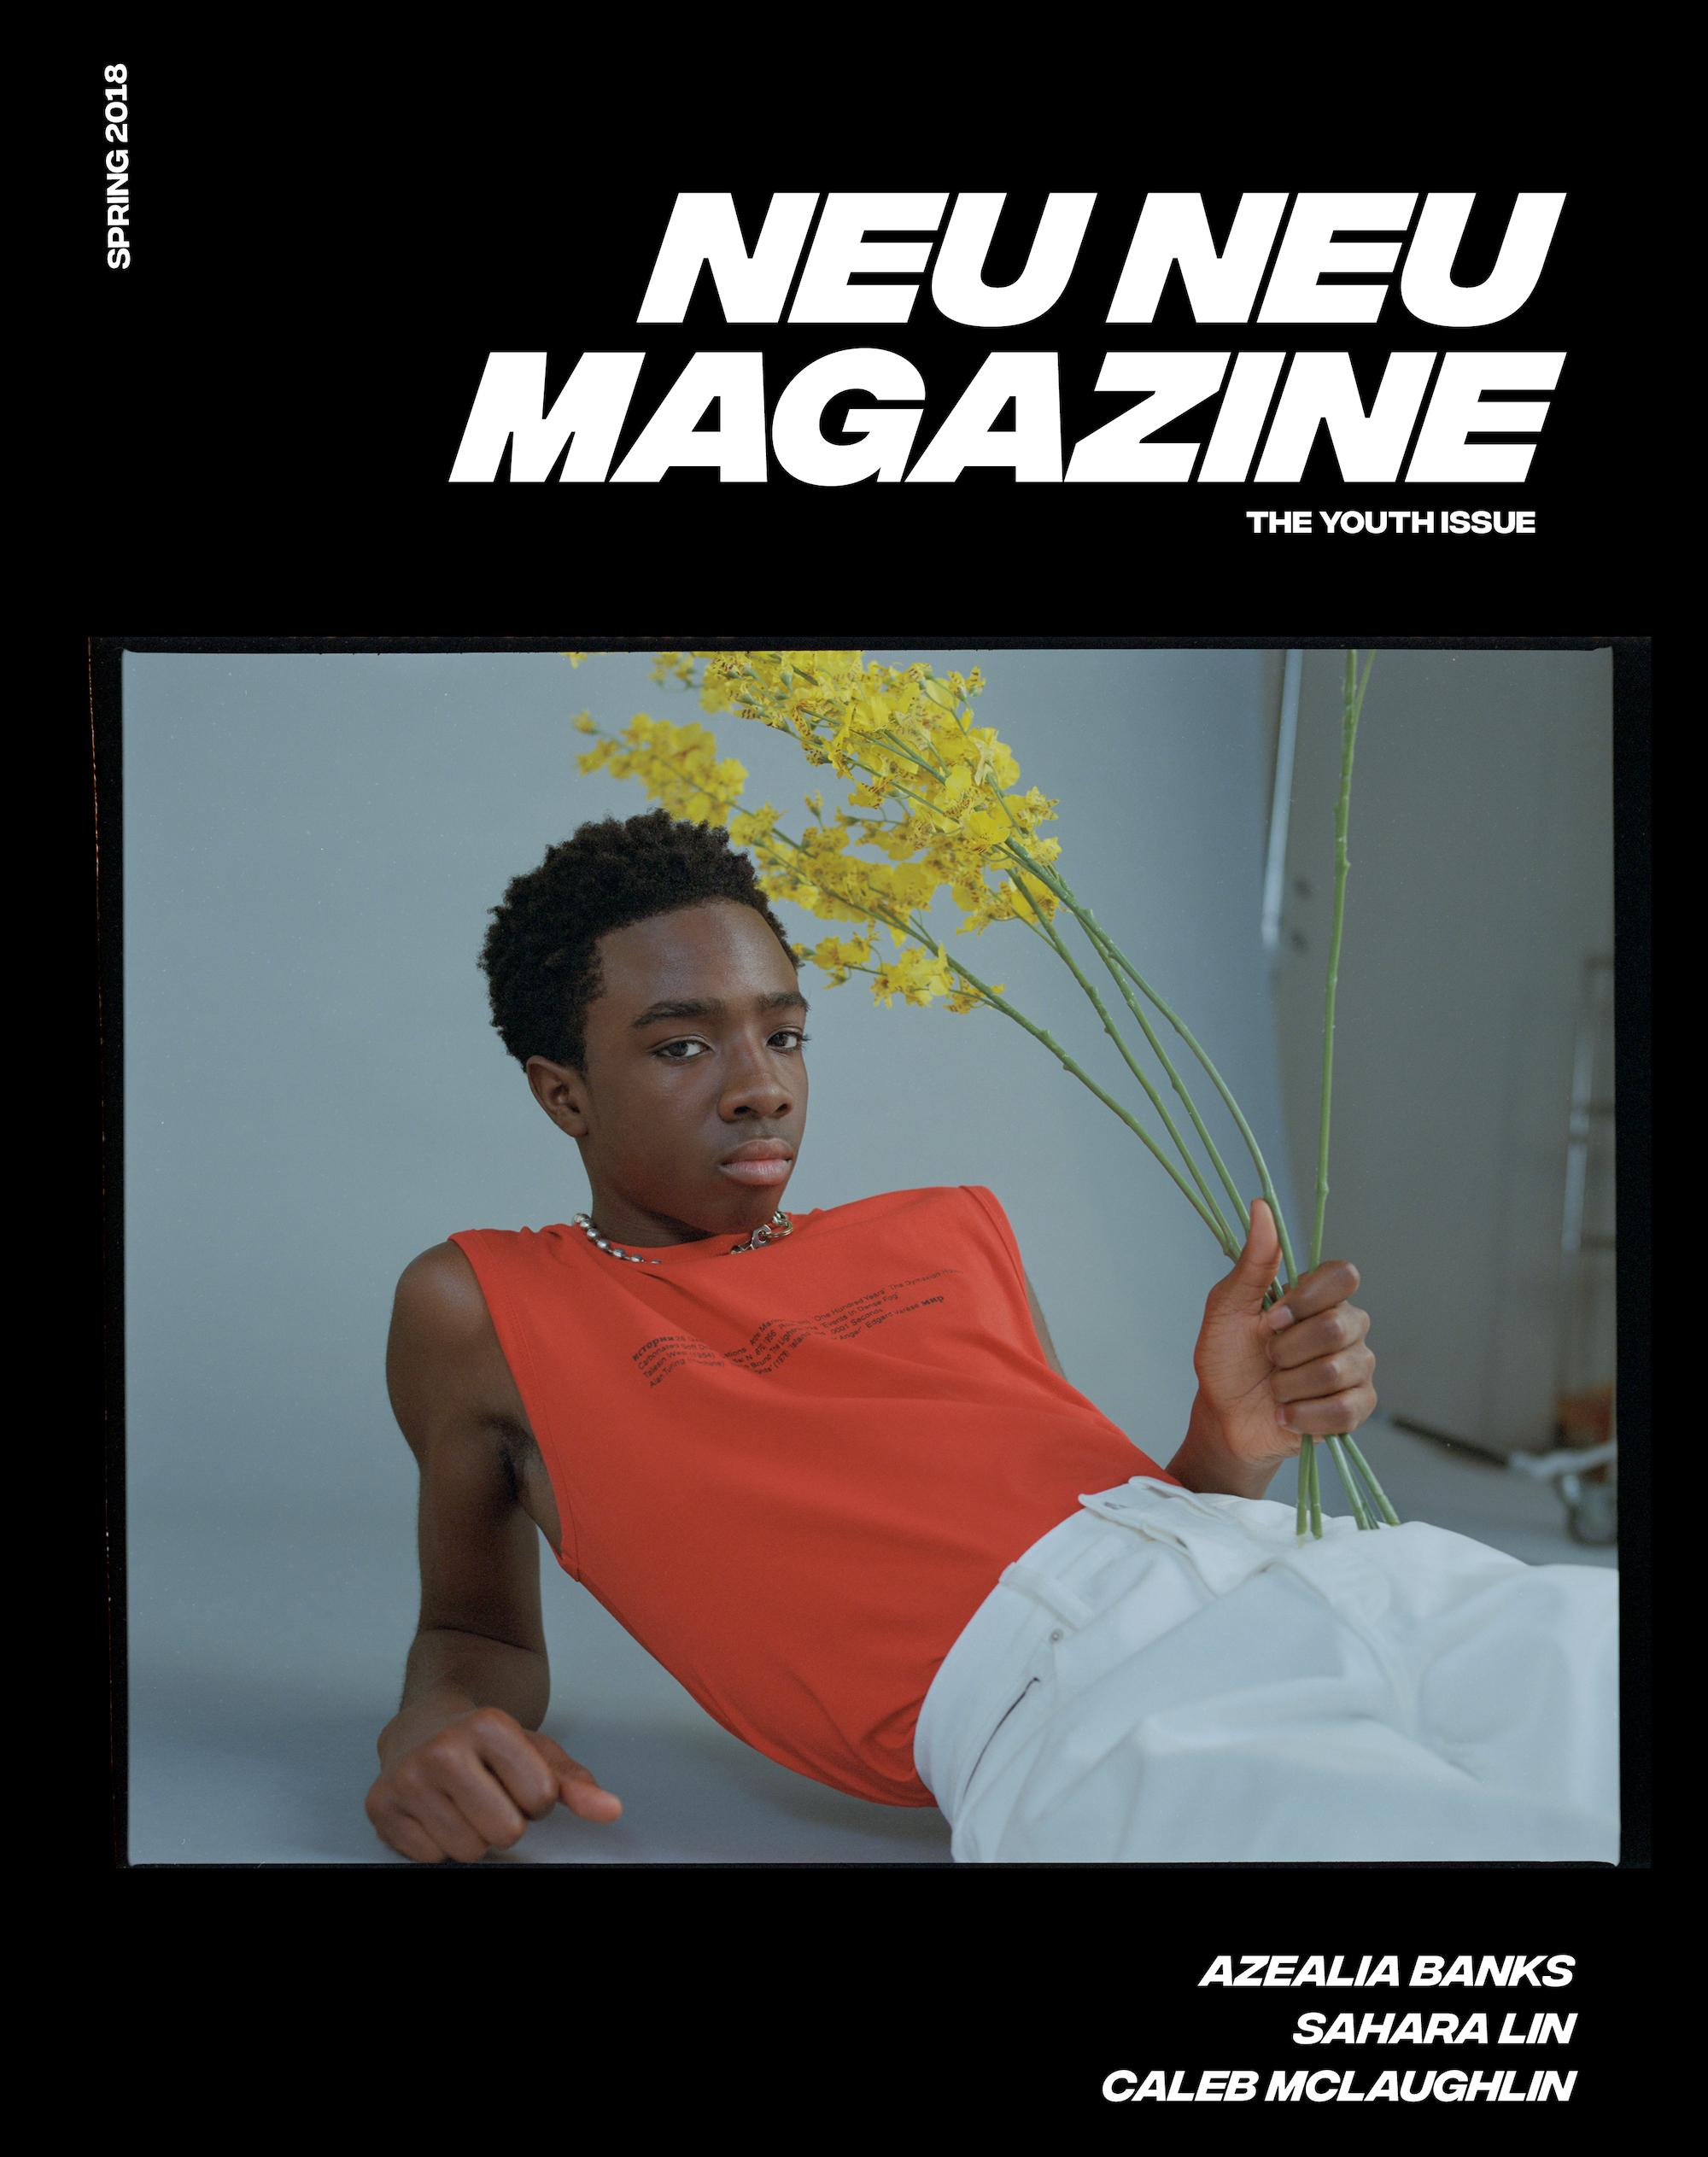 Neu Neu Magazine ft. Caleb McLaughlin